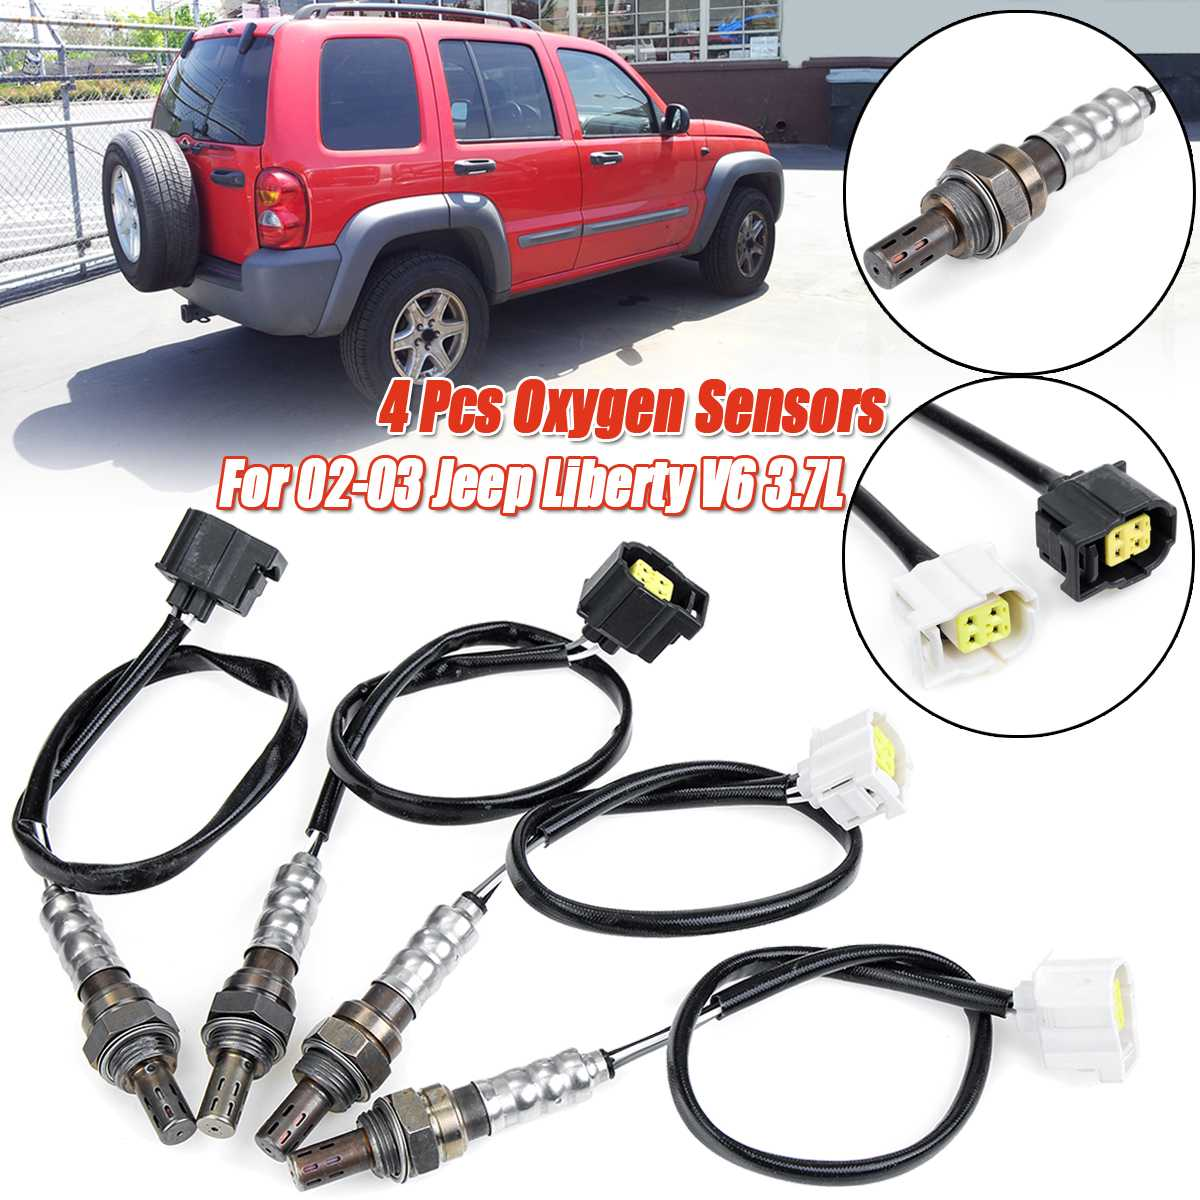 4Pcs Upstream & Downstream Oxygen O2 Sensor For Jeep Liberty V6 3.7L 2002 2003 234-4217 234-4228 234-4772 234-4228 56041953AA